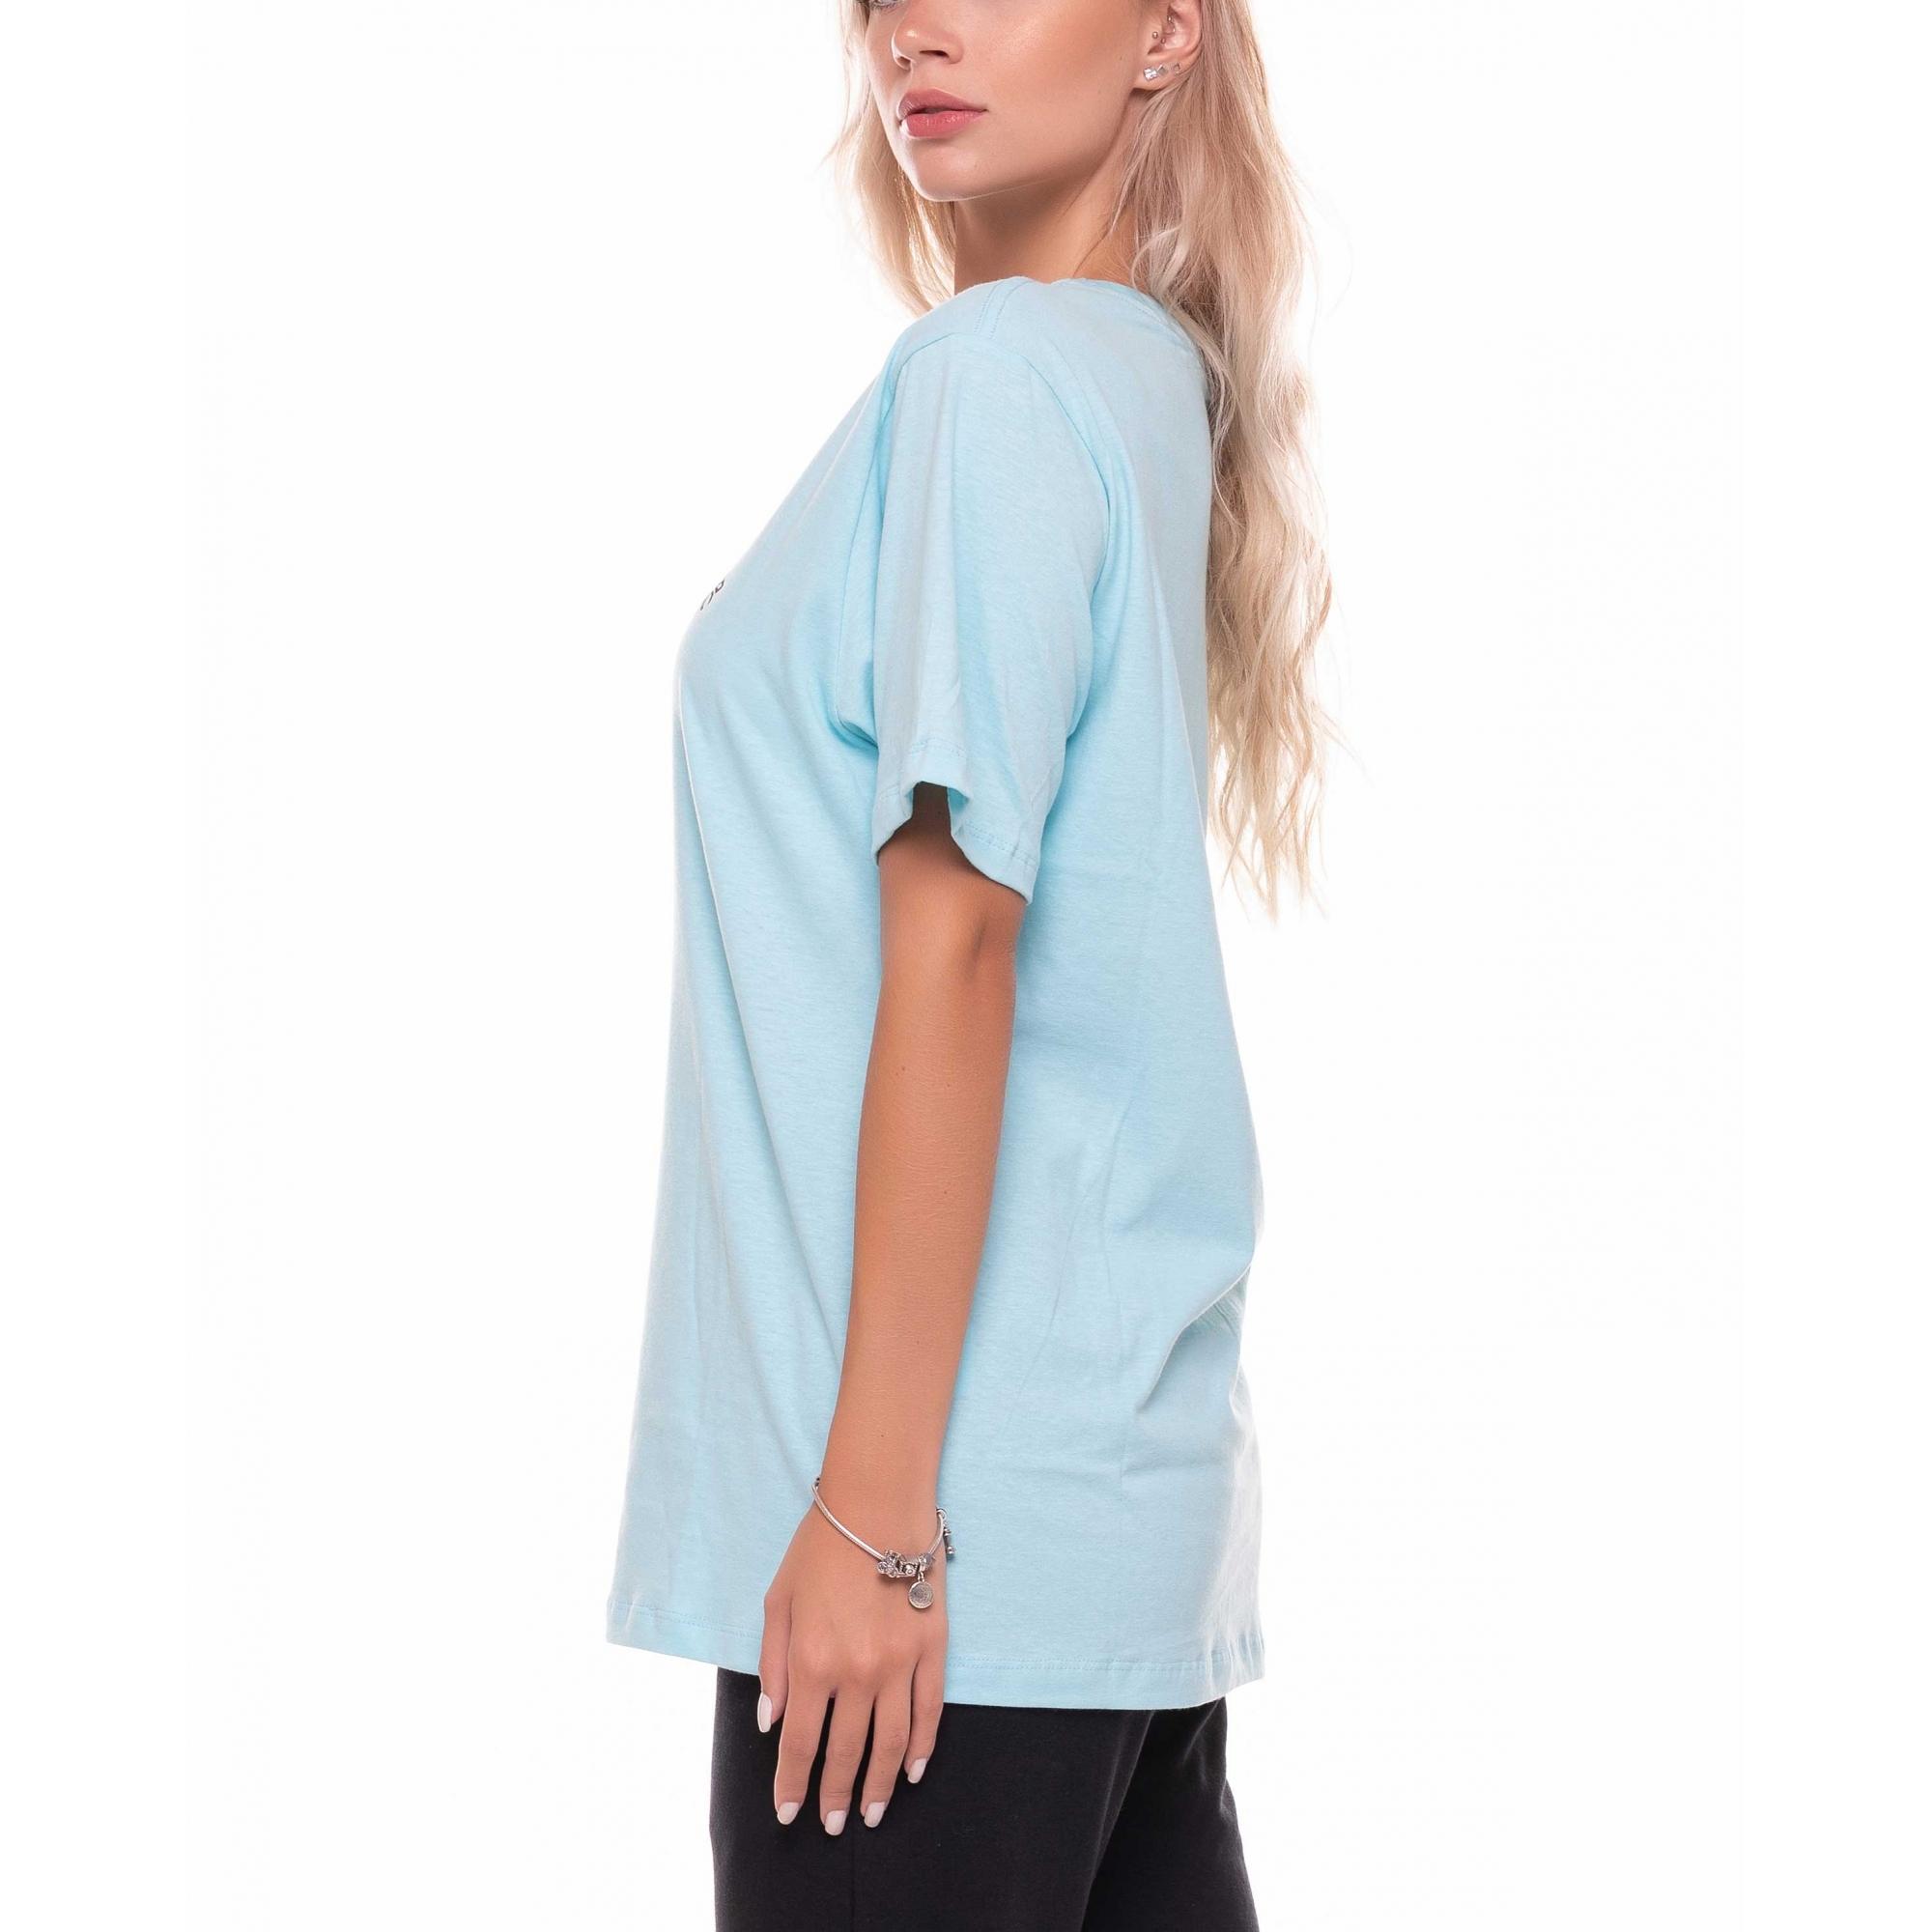 Camiseta Basic Azul Claro